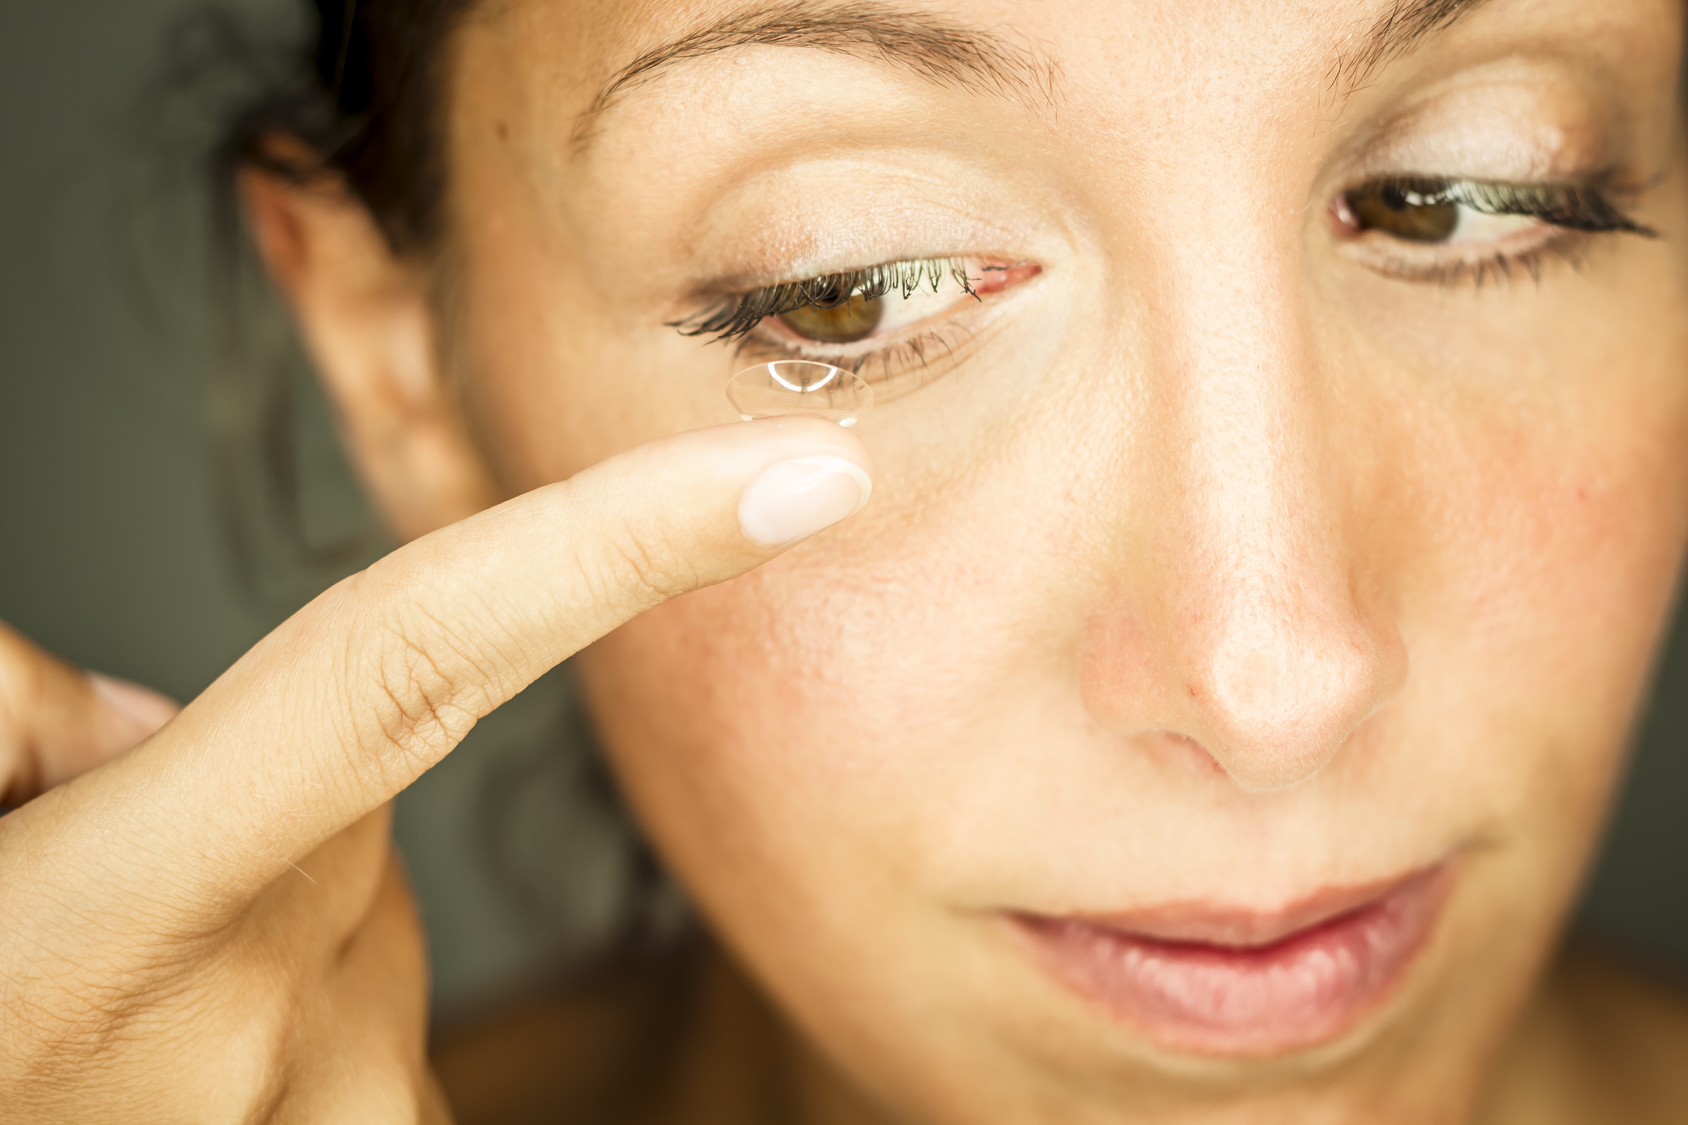 kontaktlinsen probleme